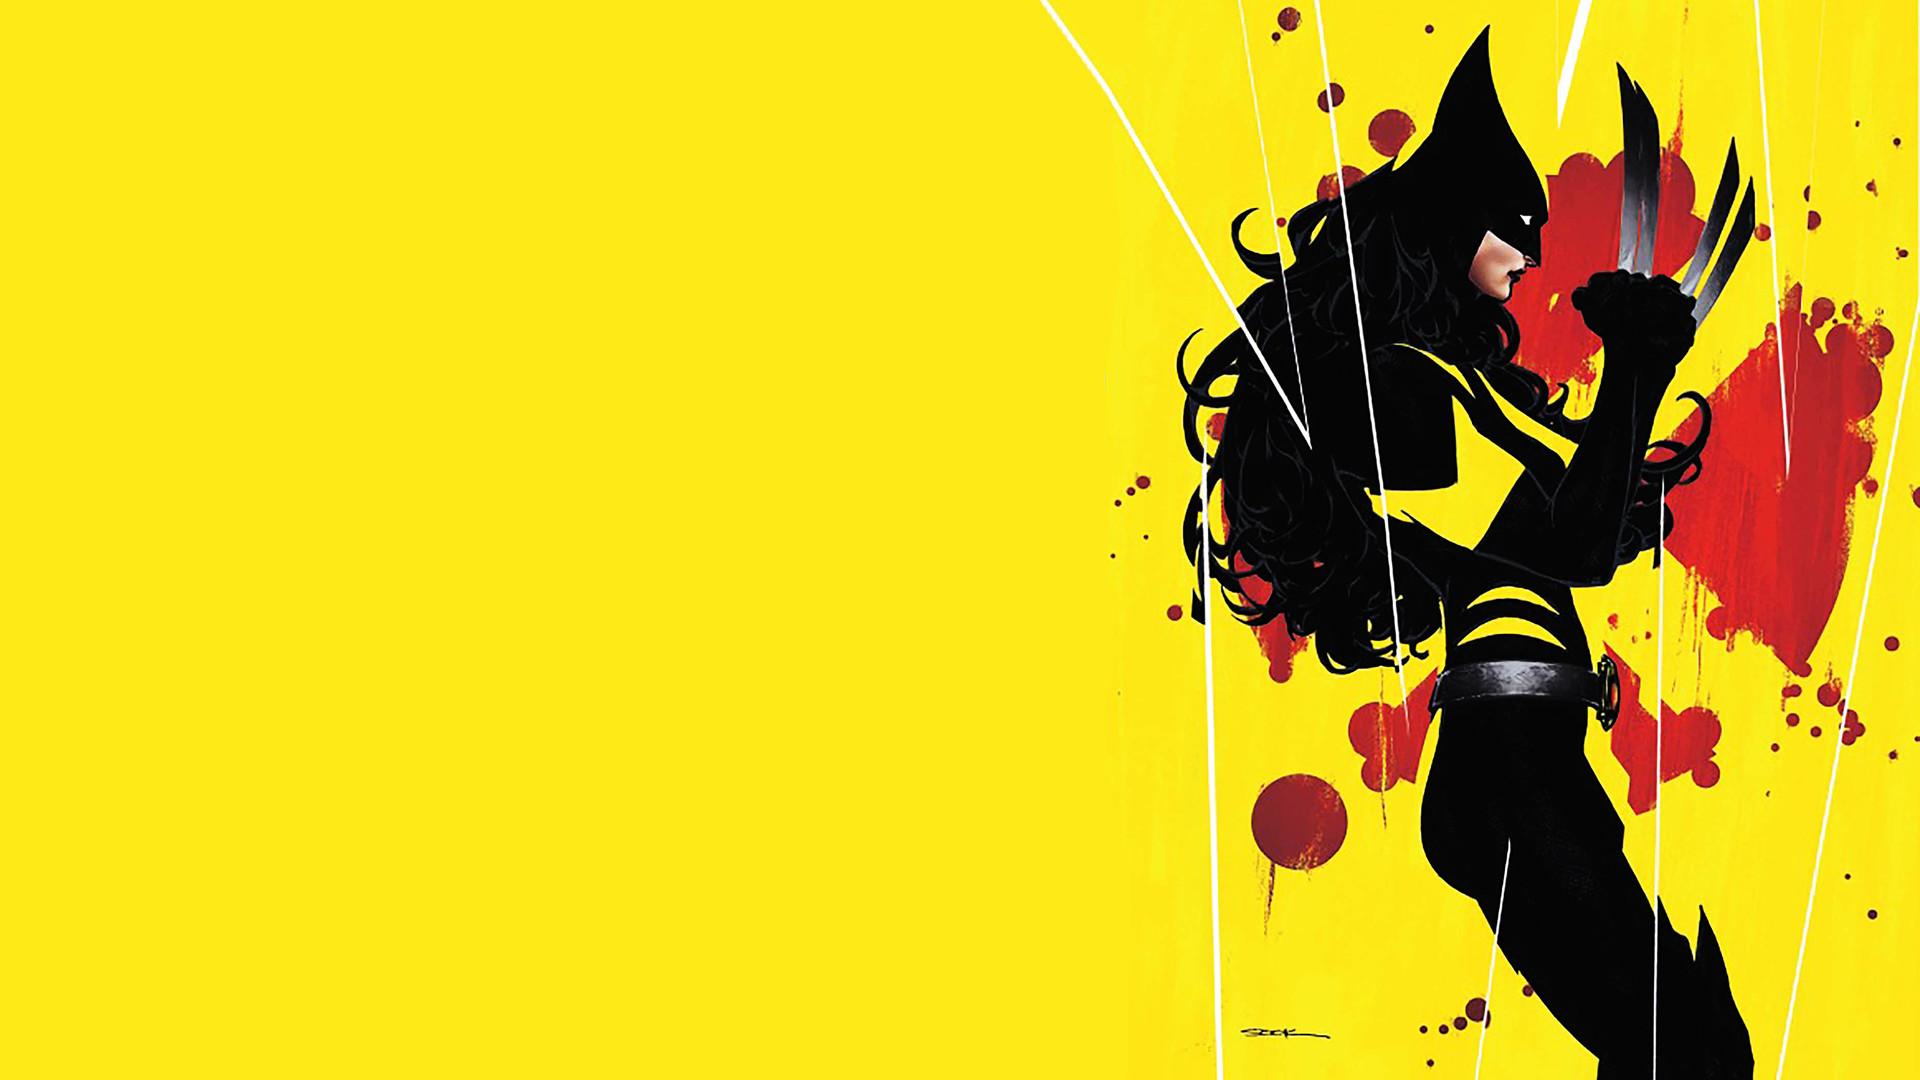 Wolverine wallpaper hd 77 images - Wallpaper wolverine 4k ...